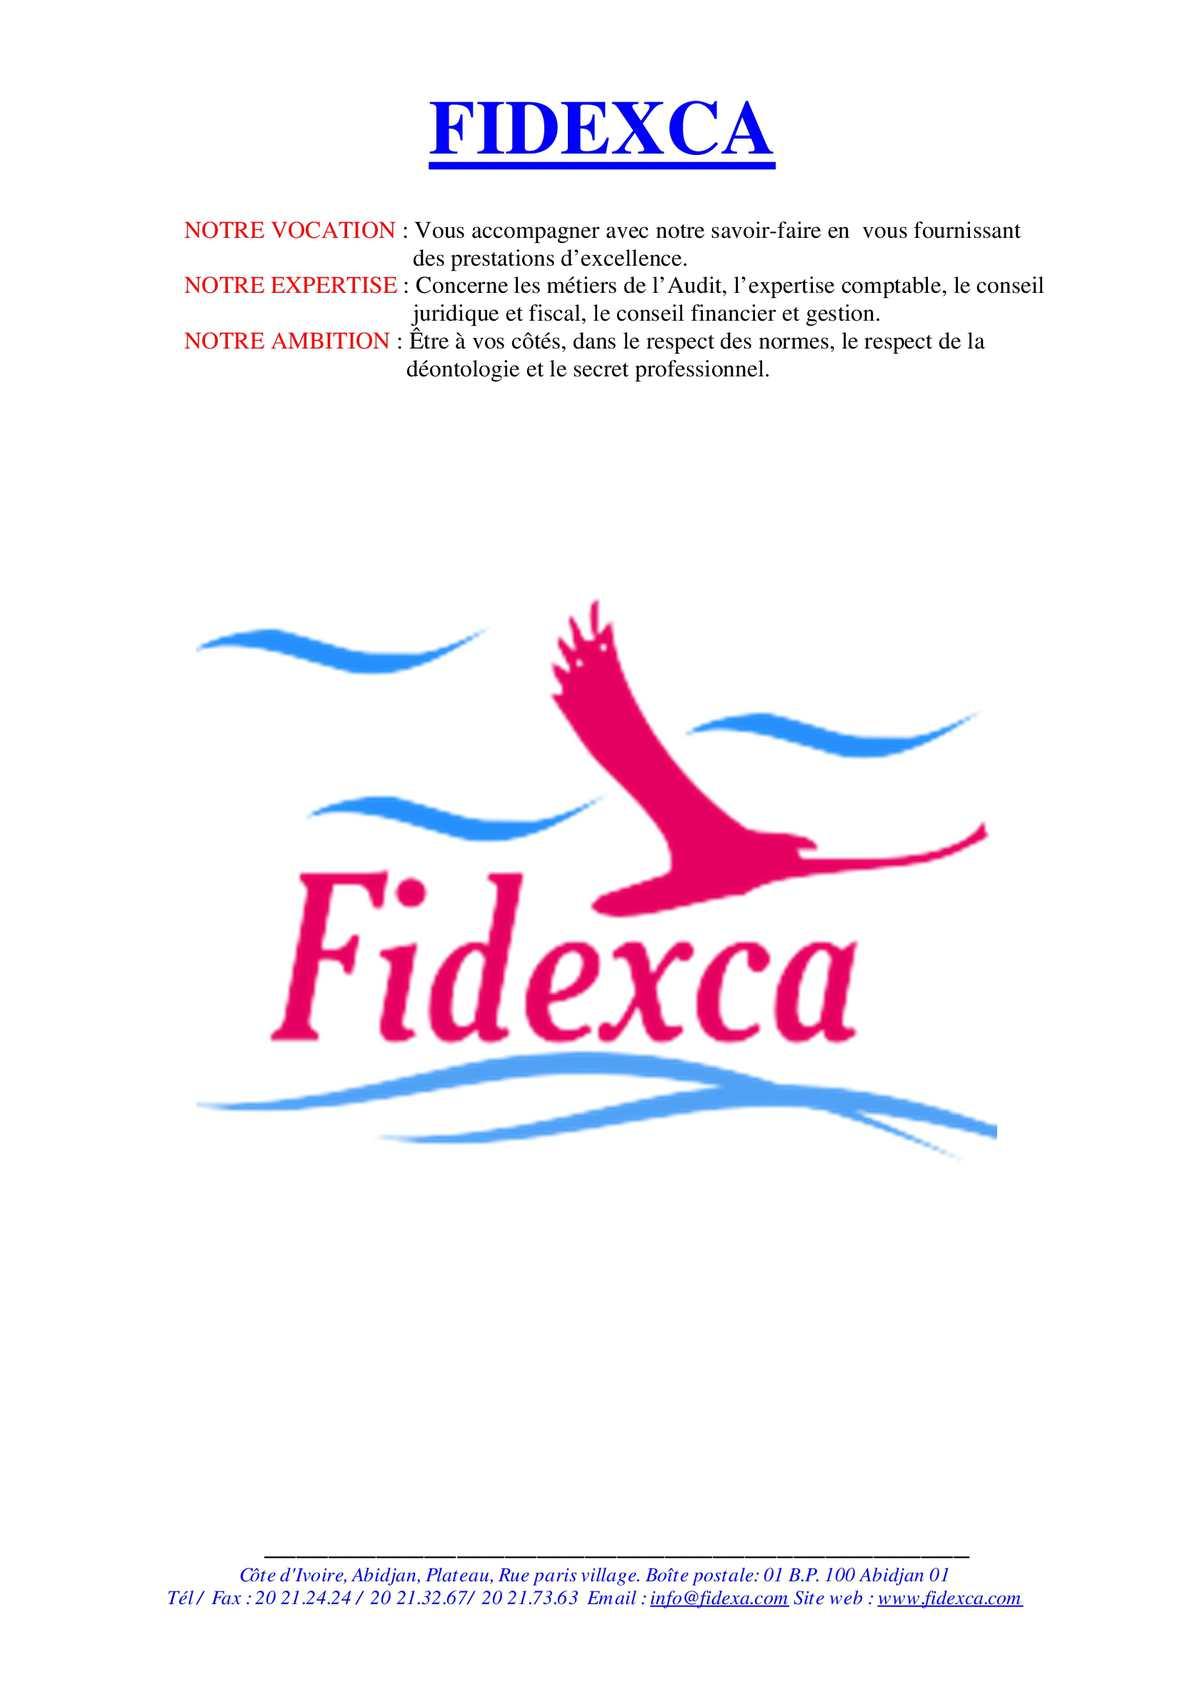 Calameo Presentation Du Cabinet Fidexca